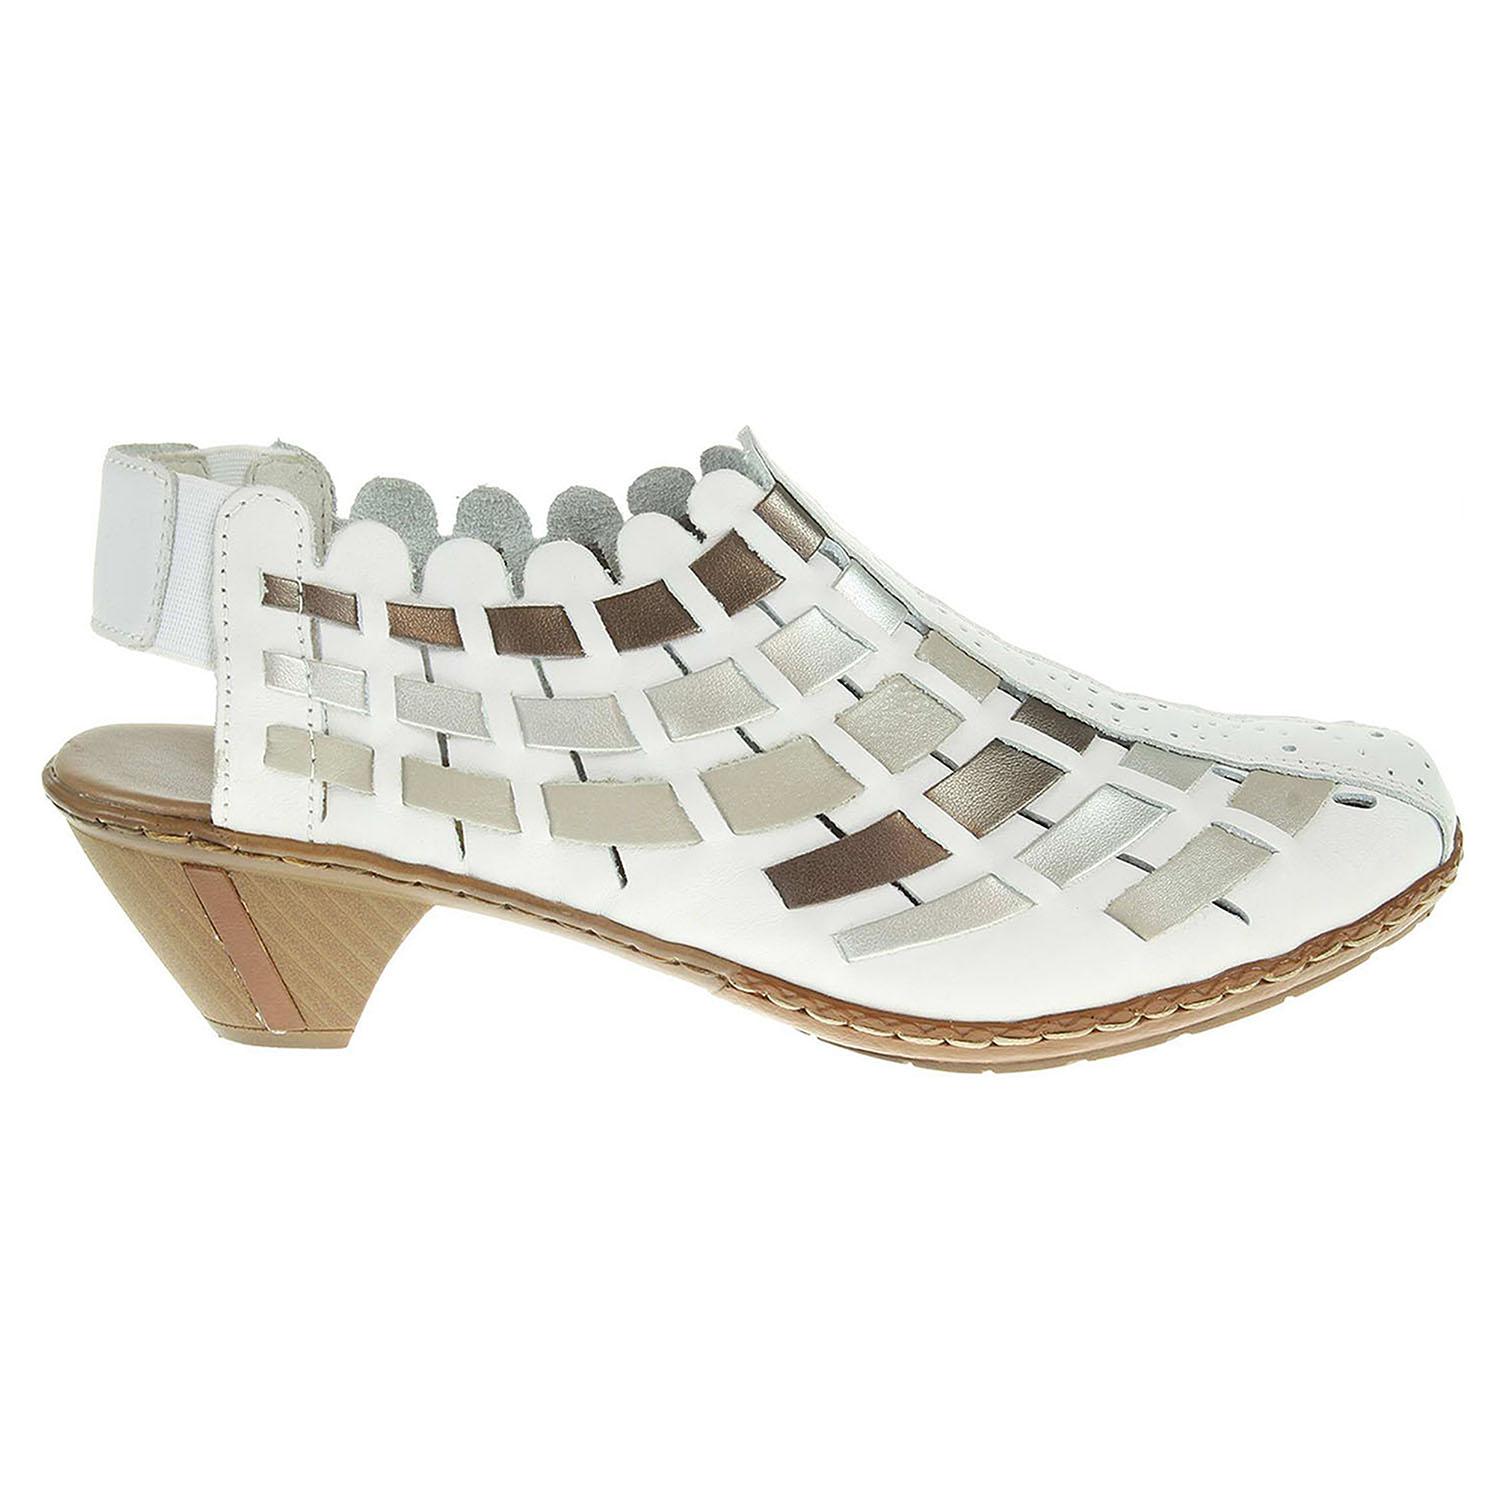 Rieker dámské sandály 46778-81 bílá-stříbrná 40